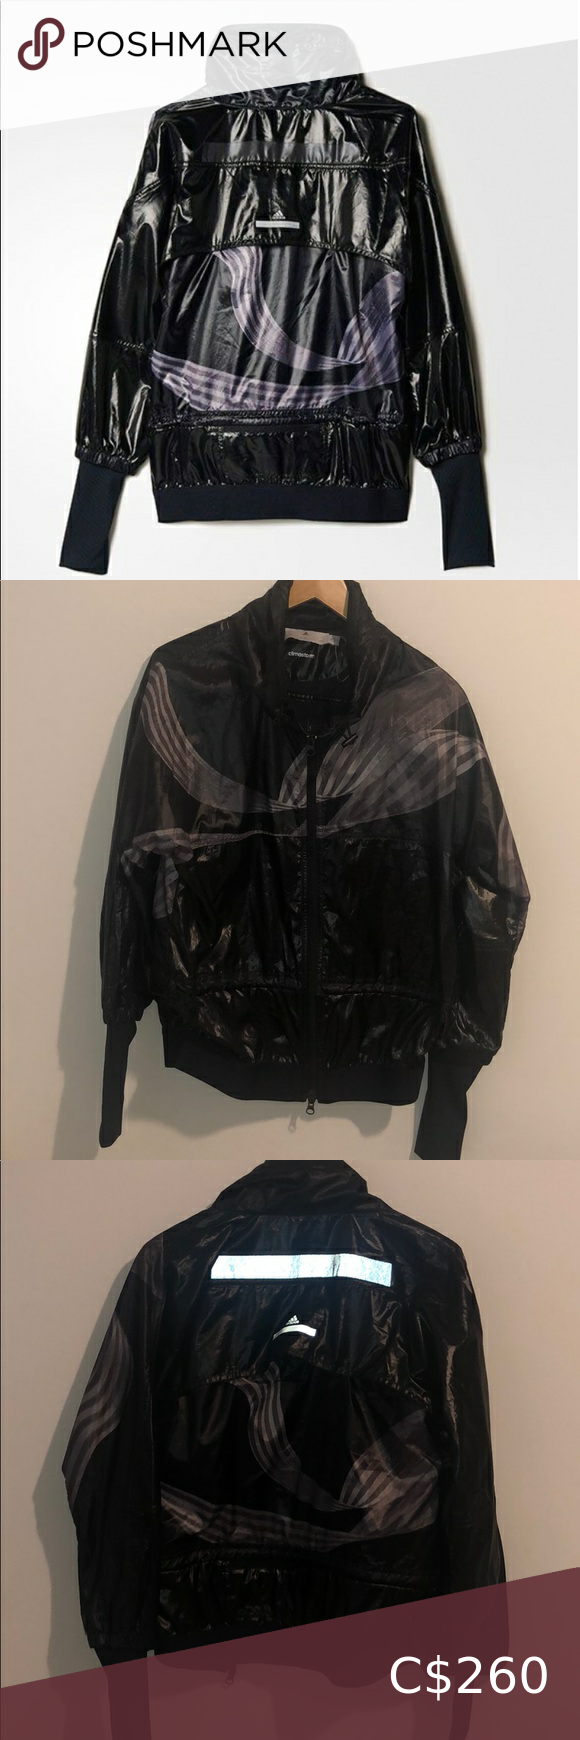 Stella McCartney Adidas Climastorm AX6991 Jacket